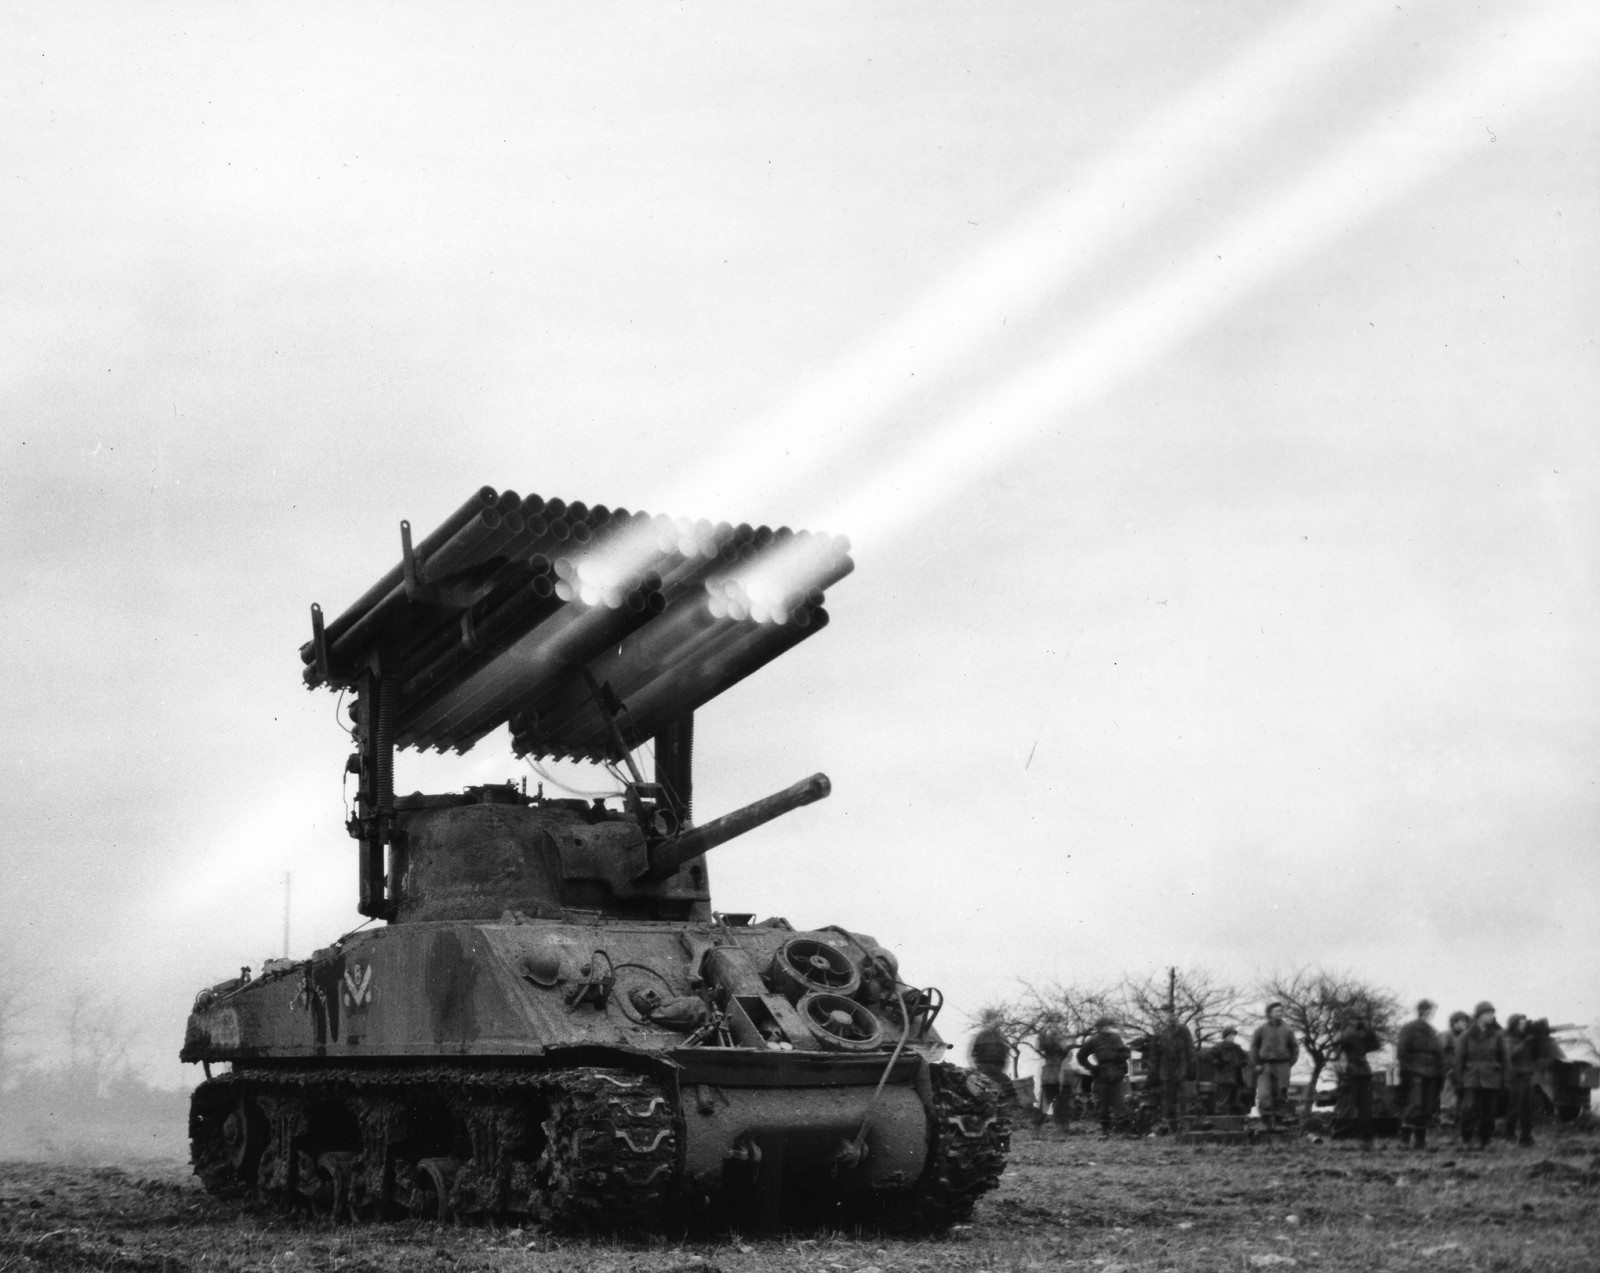 M4_Sherman_T34_Calliope (1)